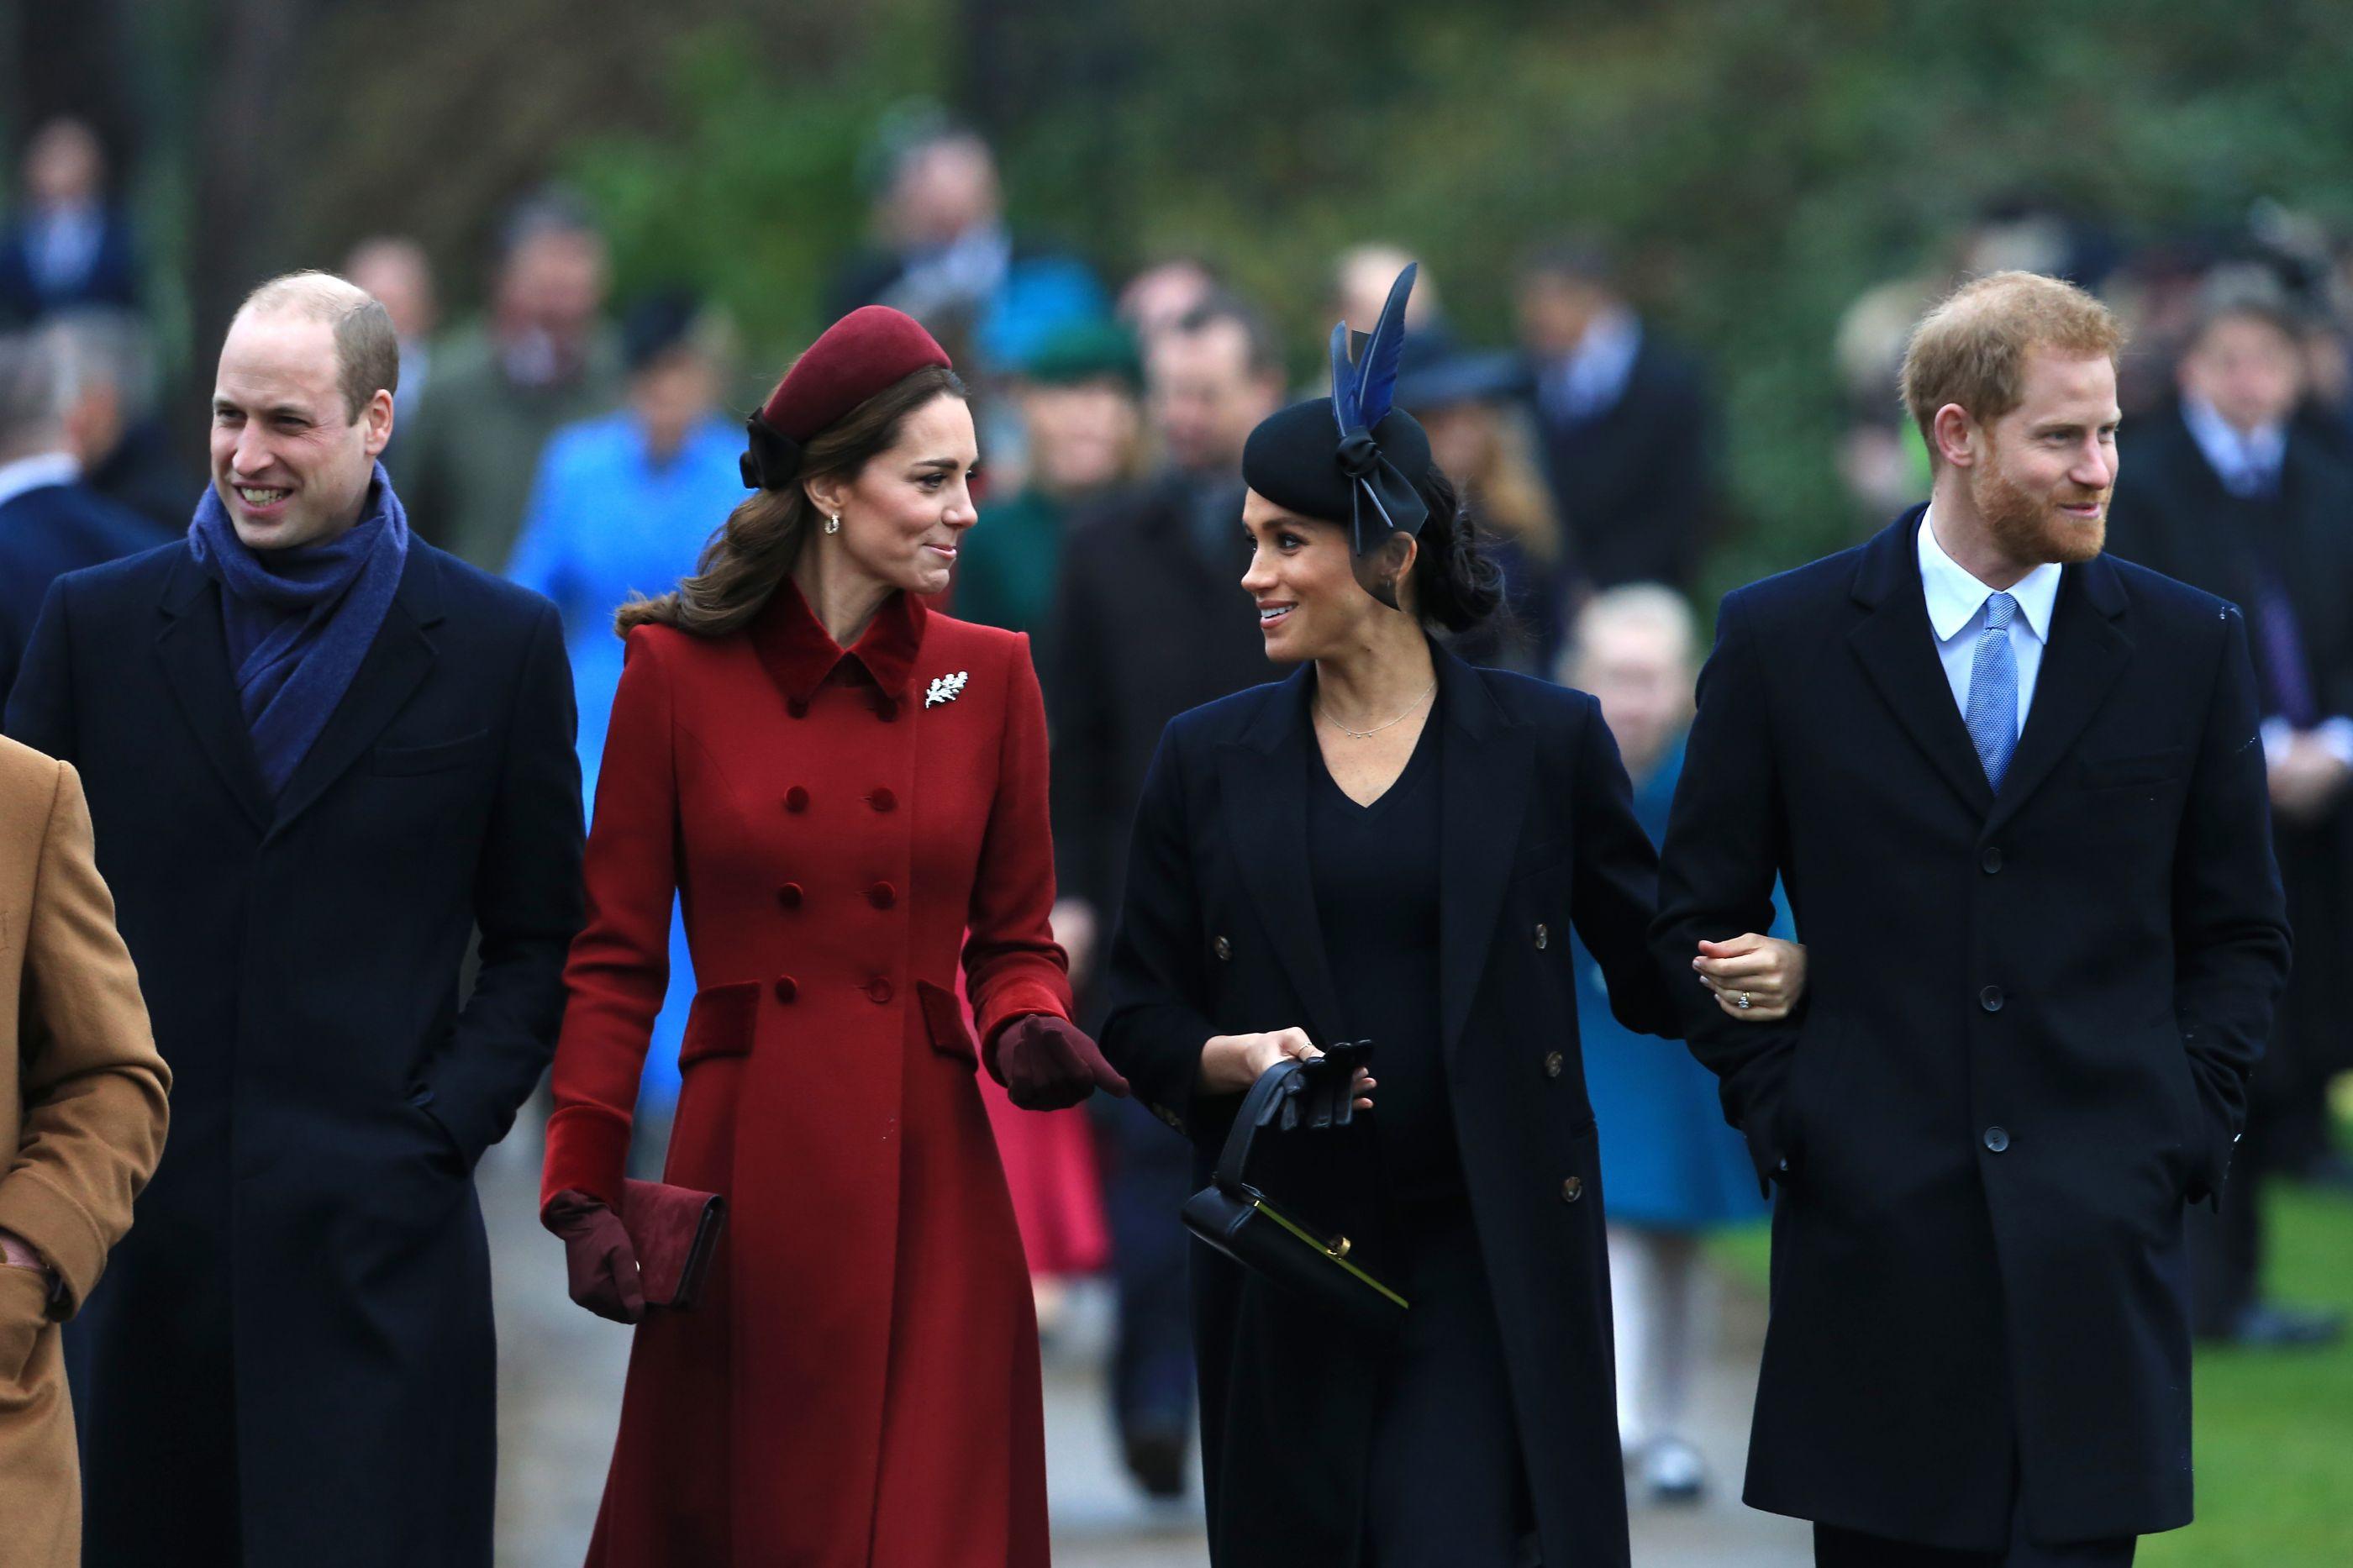 Isabel II ajudou Meghan Markle e Kate Middleton a fazerem as pazes